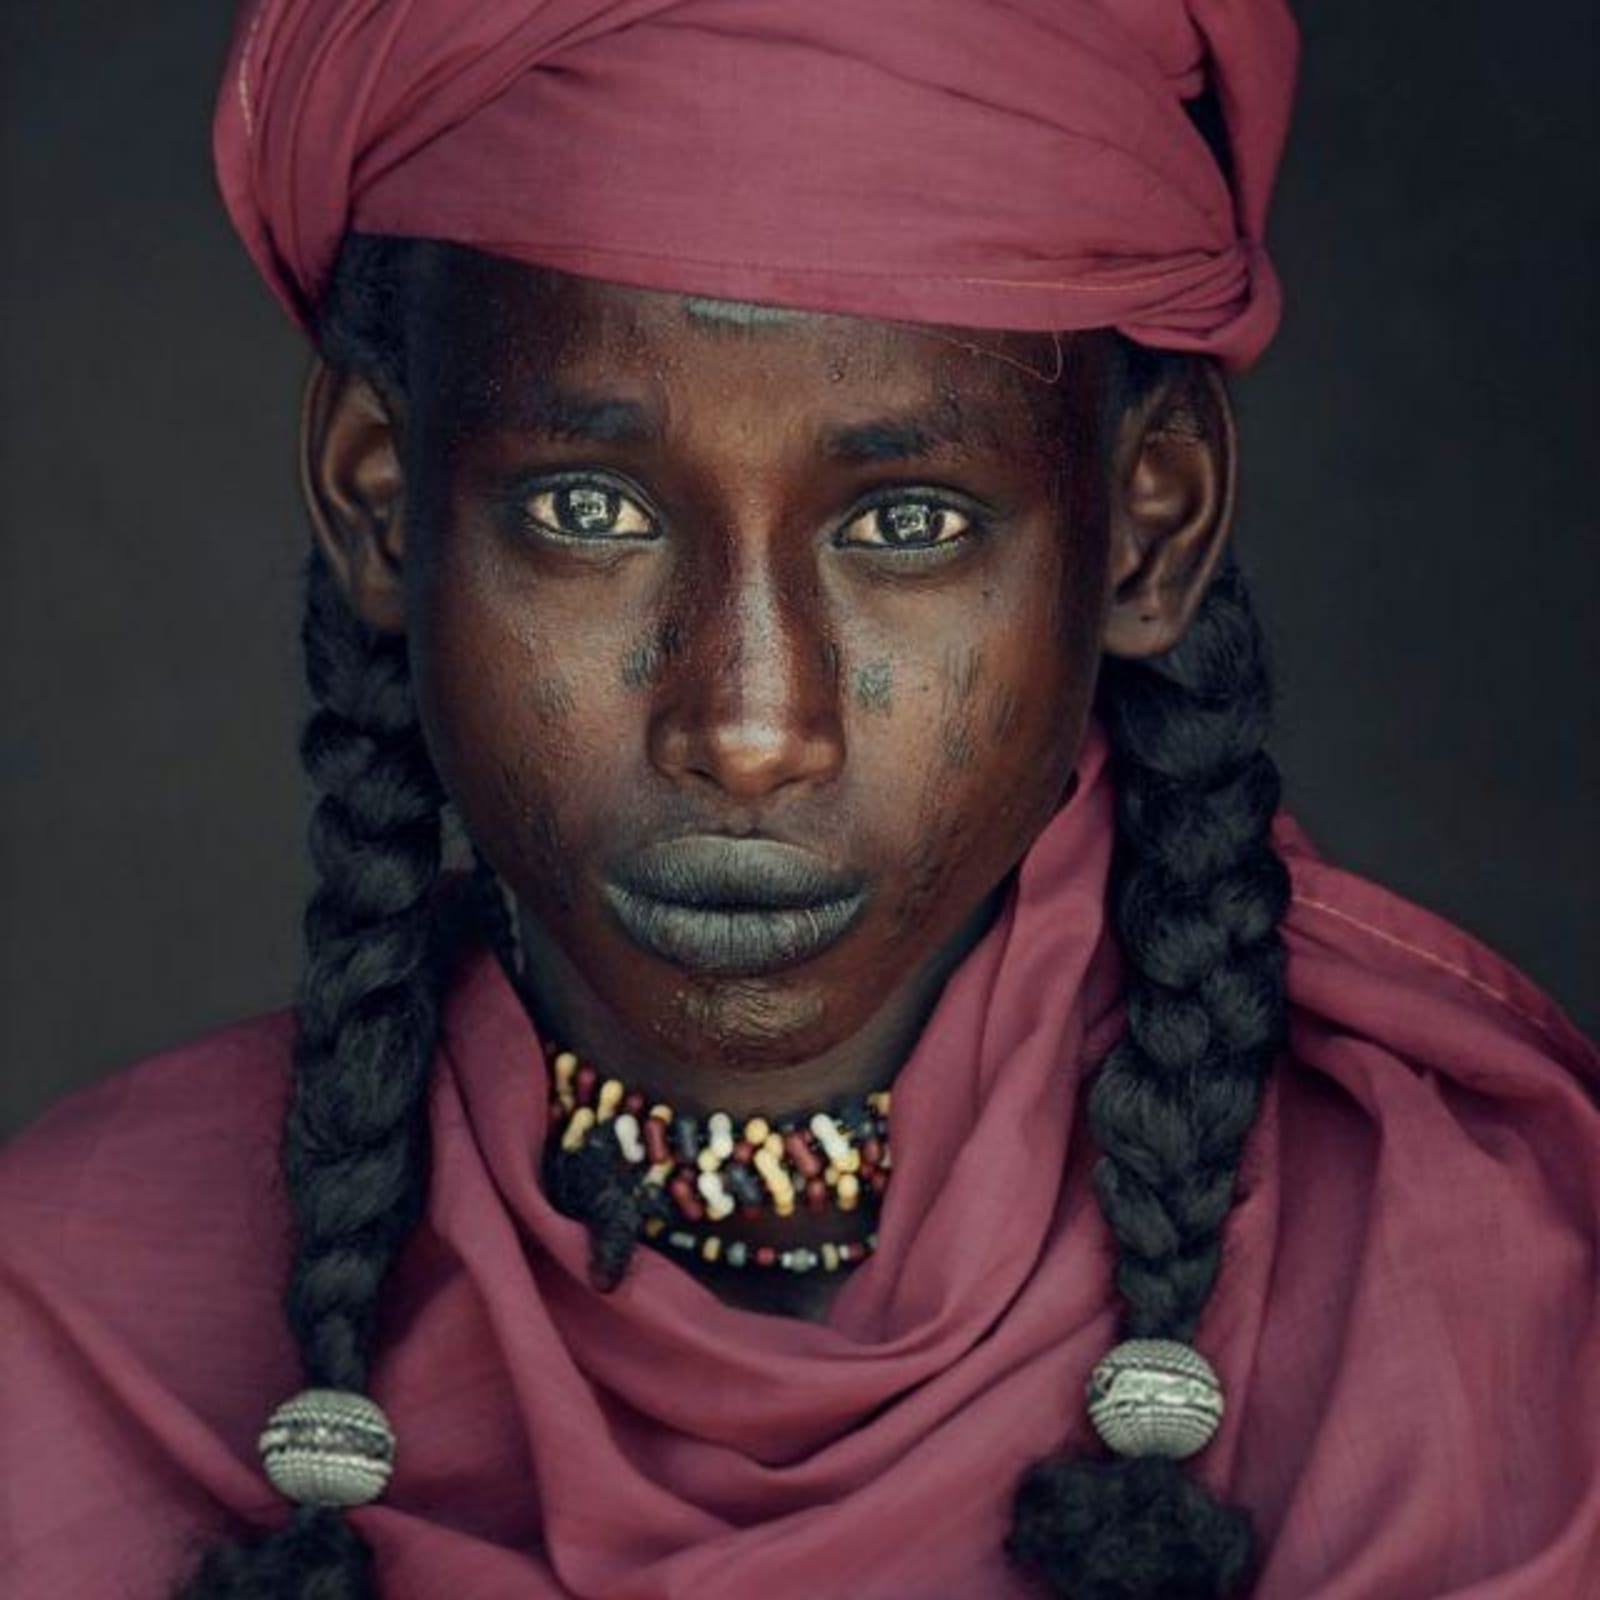 Jimmy Nelson  Angelo, Soedoe Soechay, Gerewol, Bossio, Chad, 2016  Archival Print  Image size 60 x 48 cm  Framed size 79 x 67 cm  Edition of 9 plus 2 artist's proof